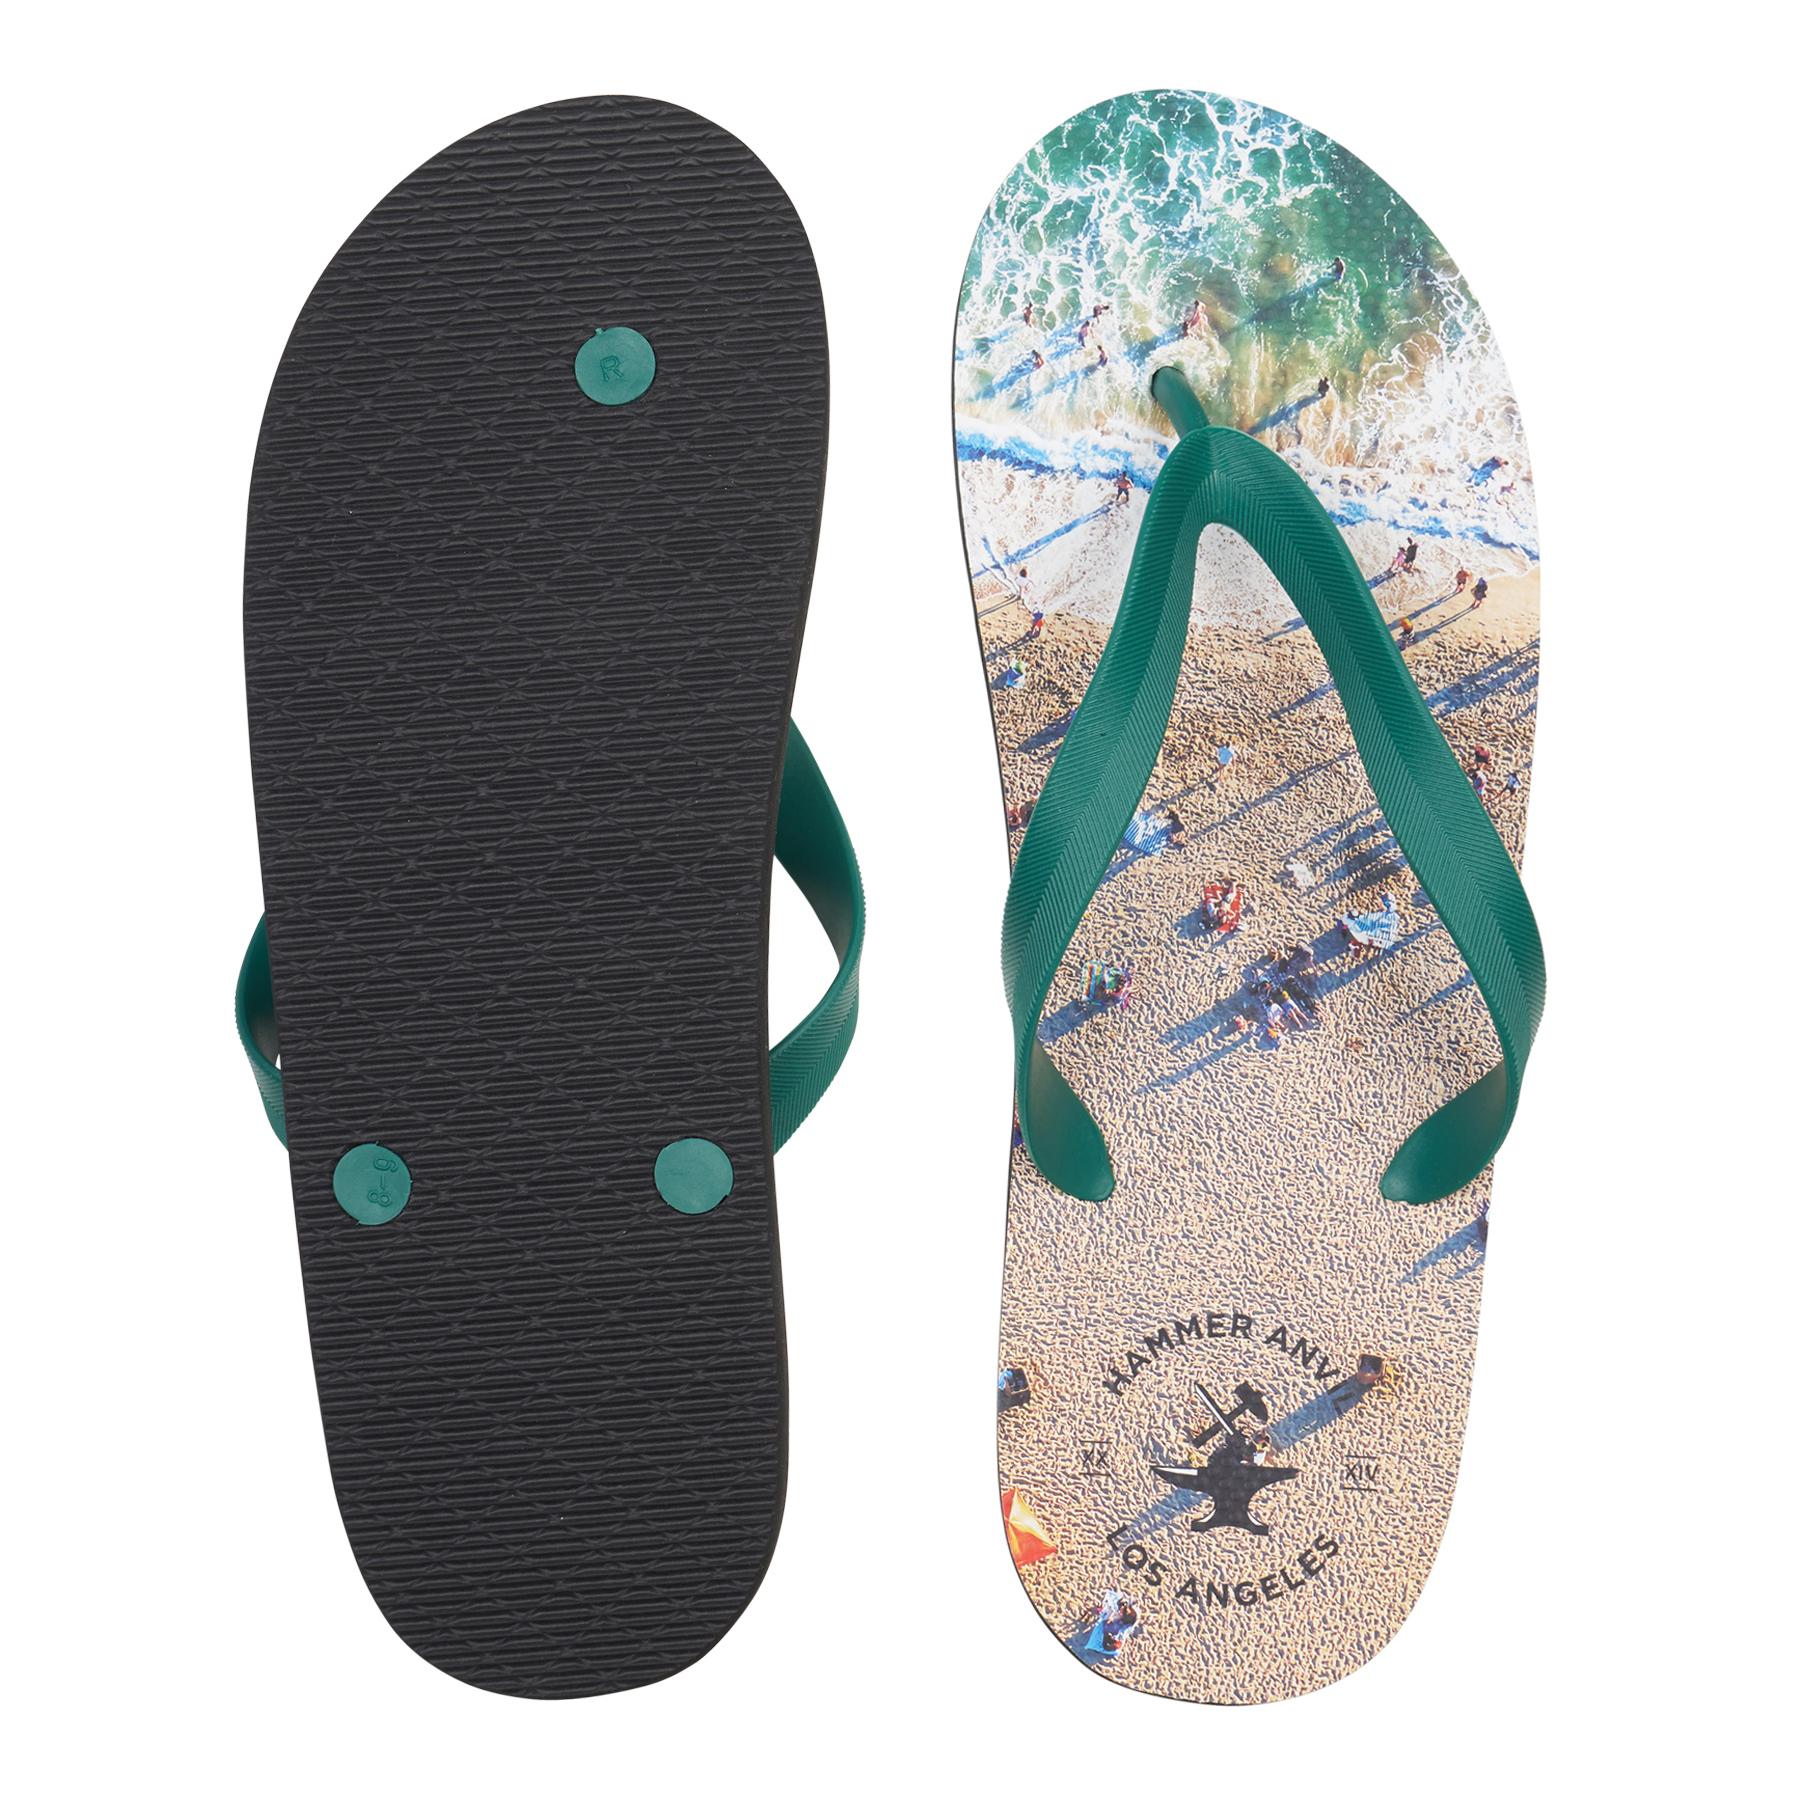 Hammer-Anvil-Mens-Flip-Flops-Casual-Thong-Summer-Sandals-Comfortable-Beach-Shoes thumbnail 14